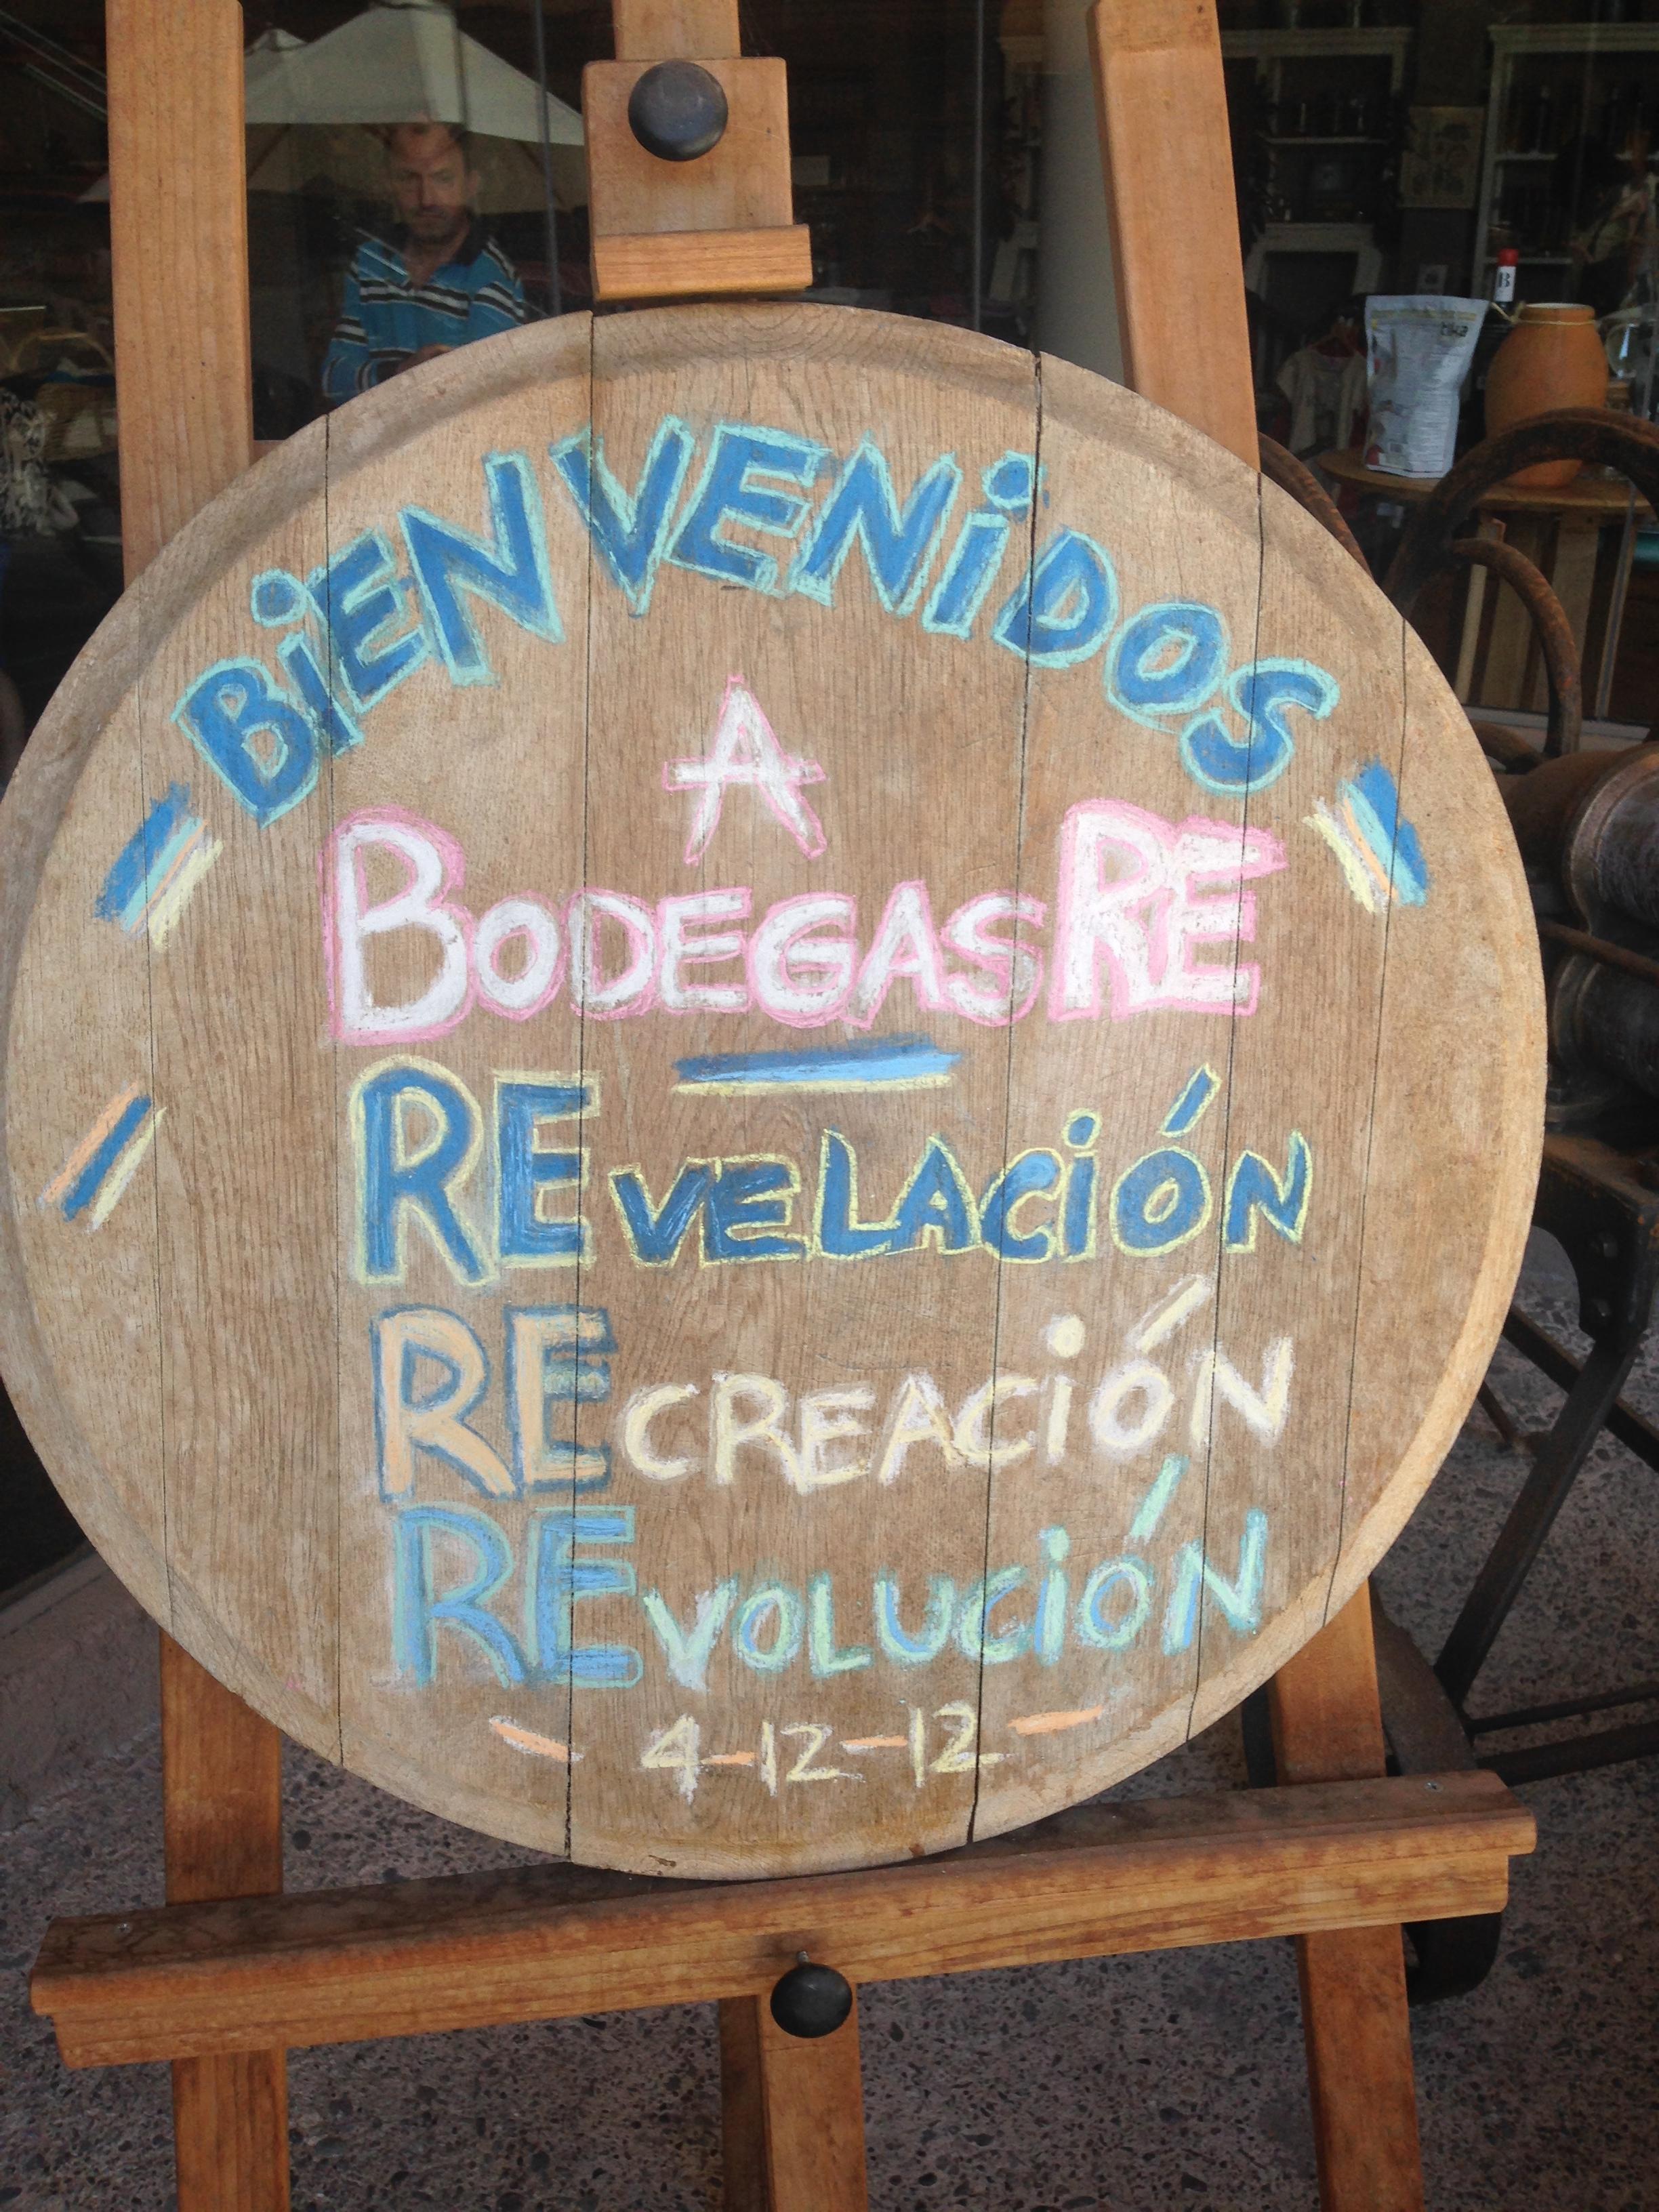 Revelacion, Recreacion, Revolucion. Credit   Gabe Manzo